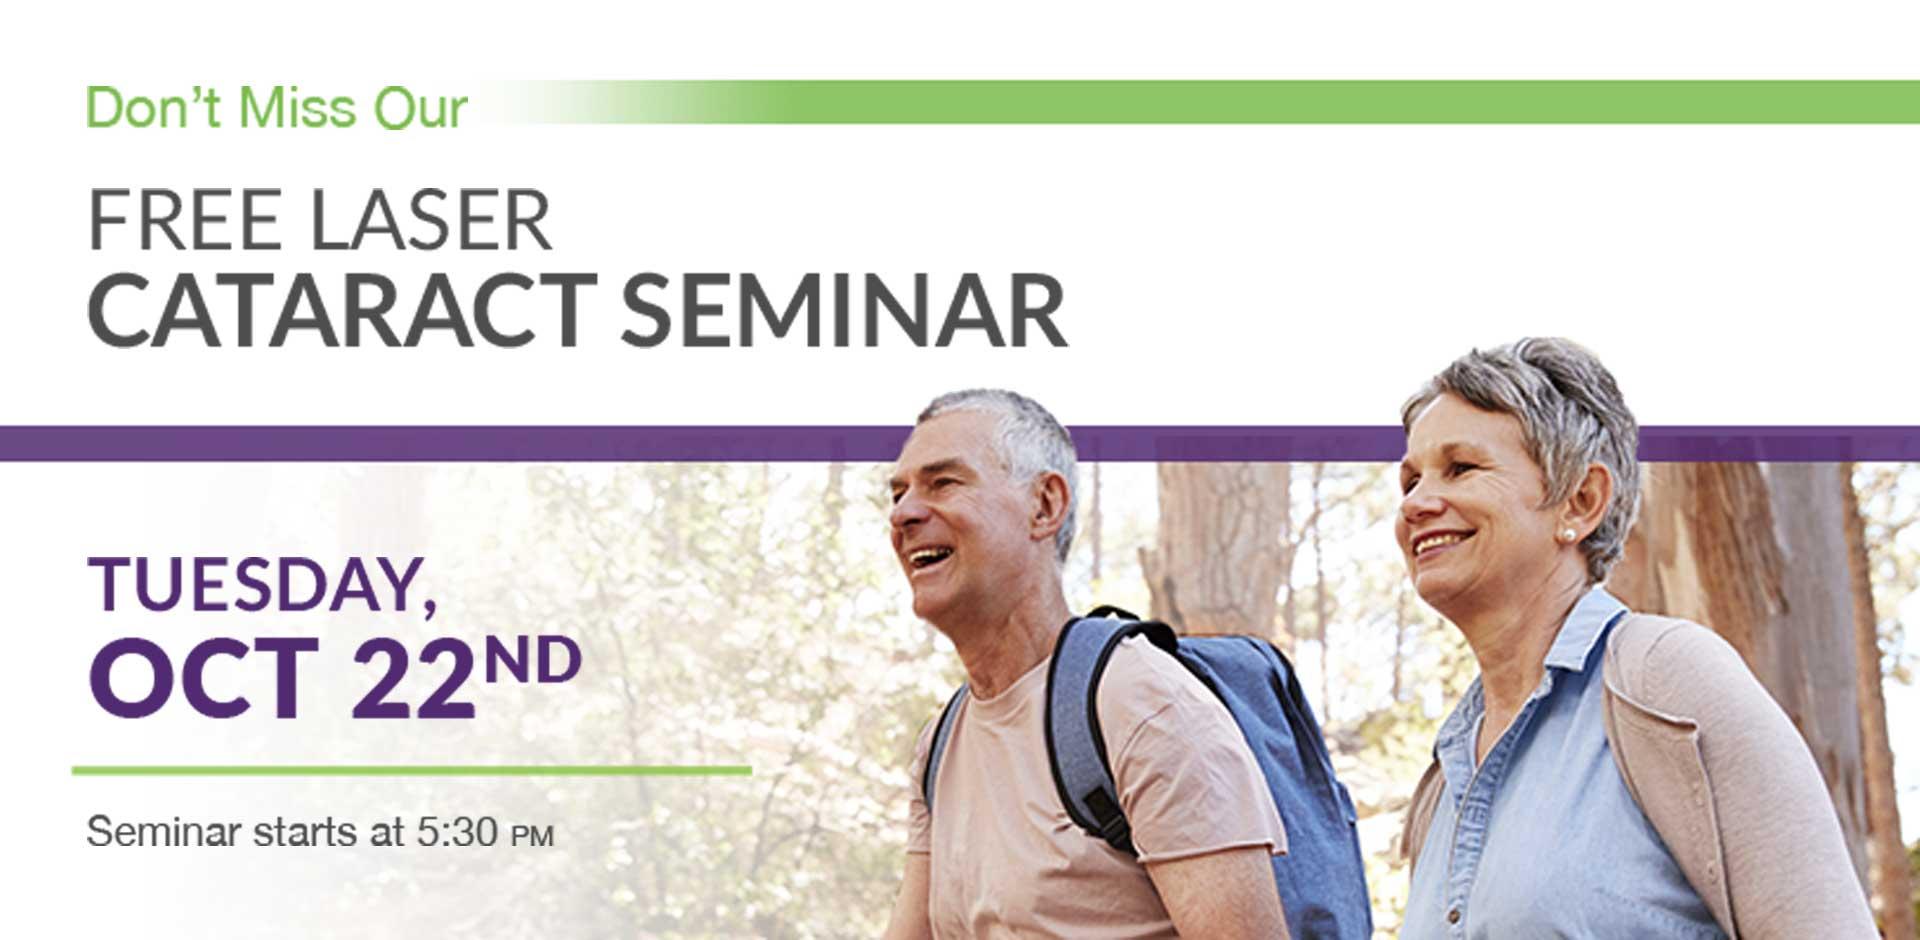 Free Cataract Seminar